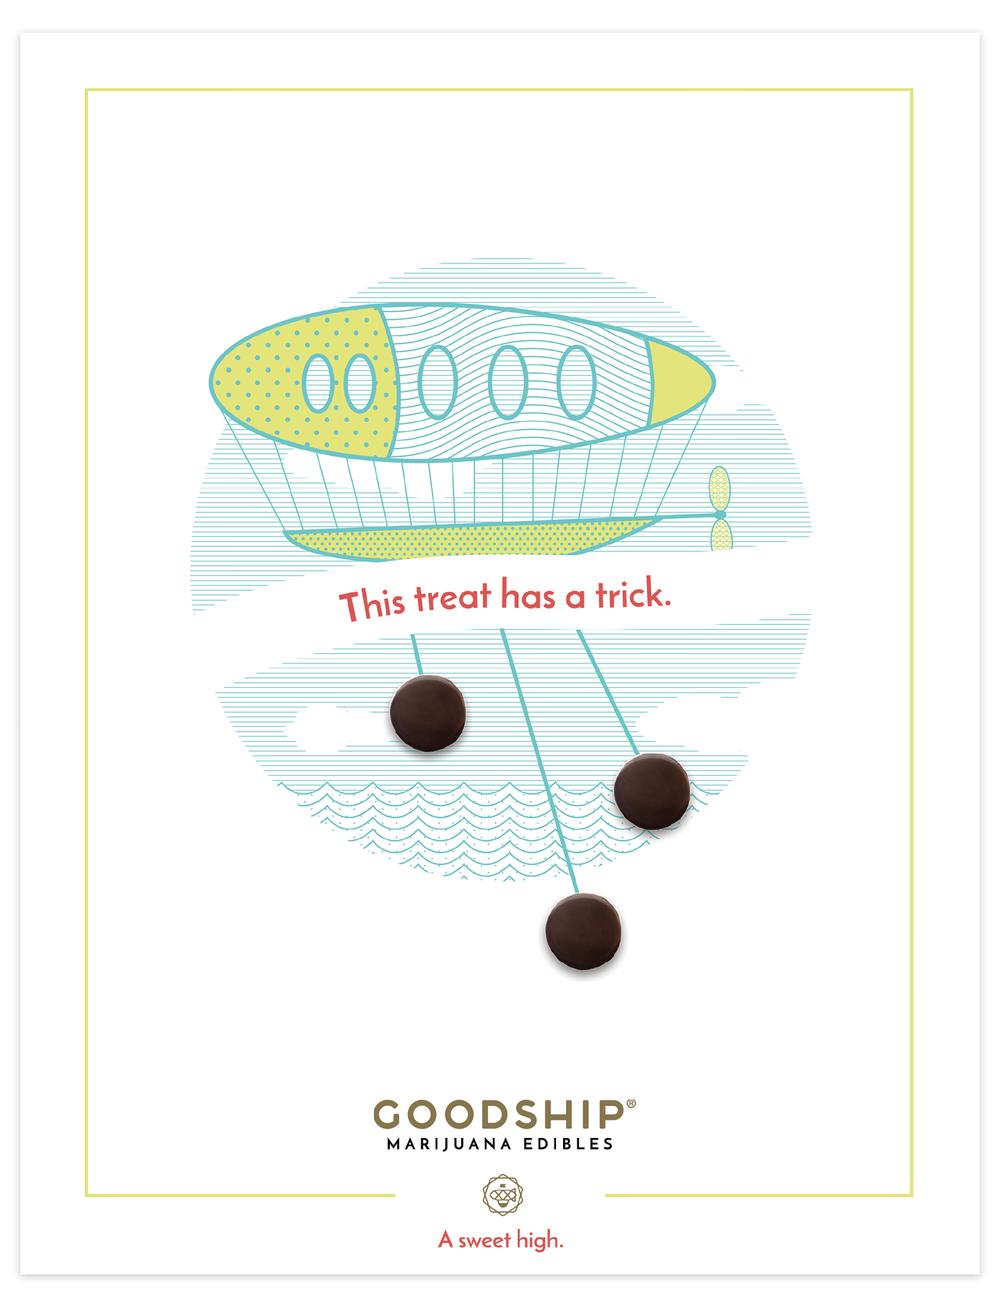 Goodship Print2.png